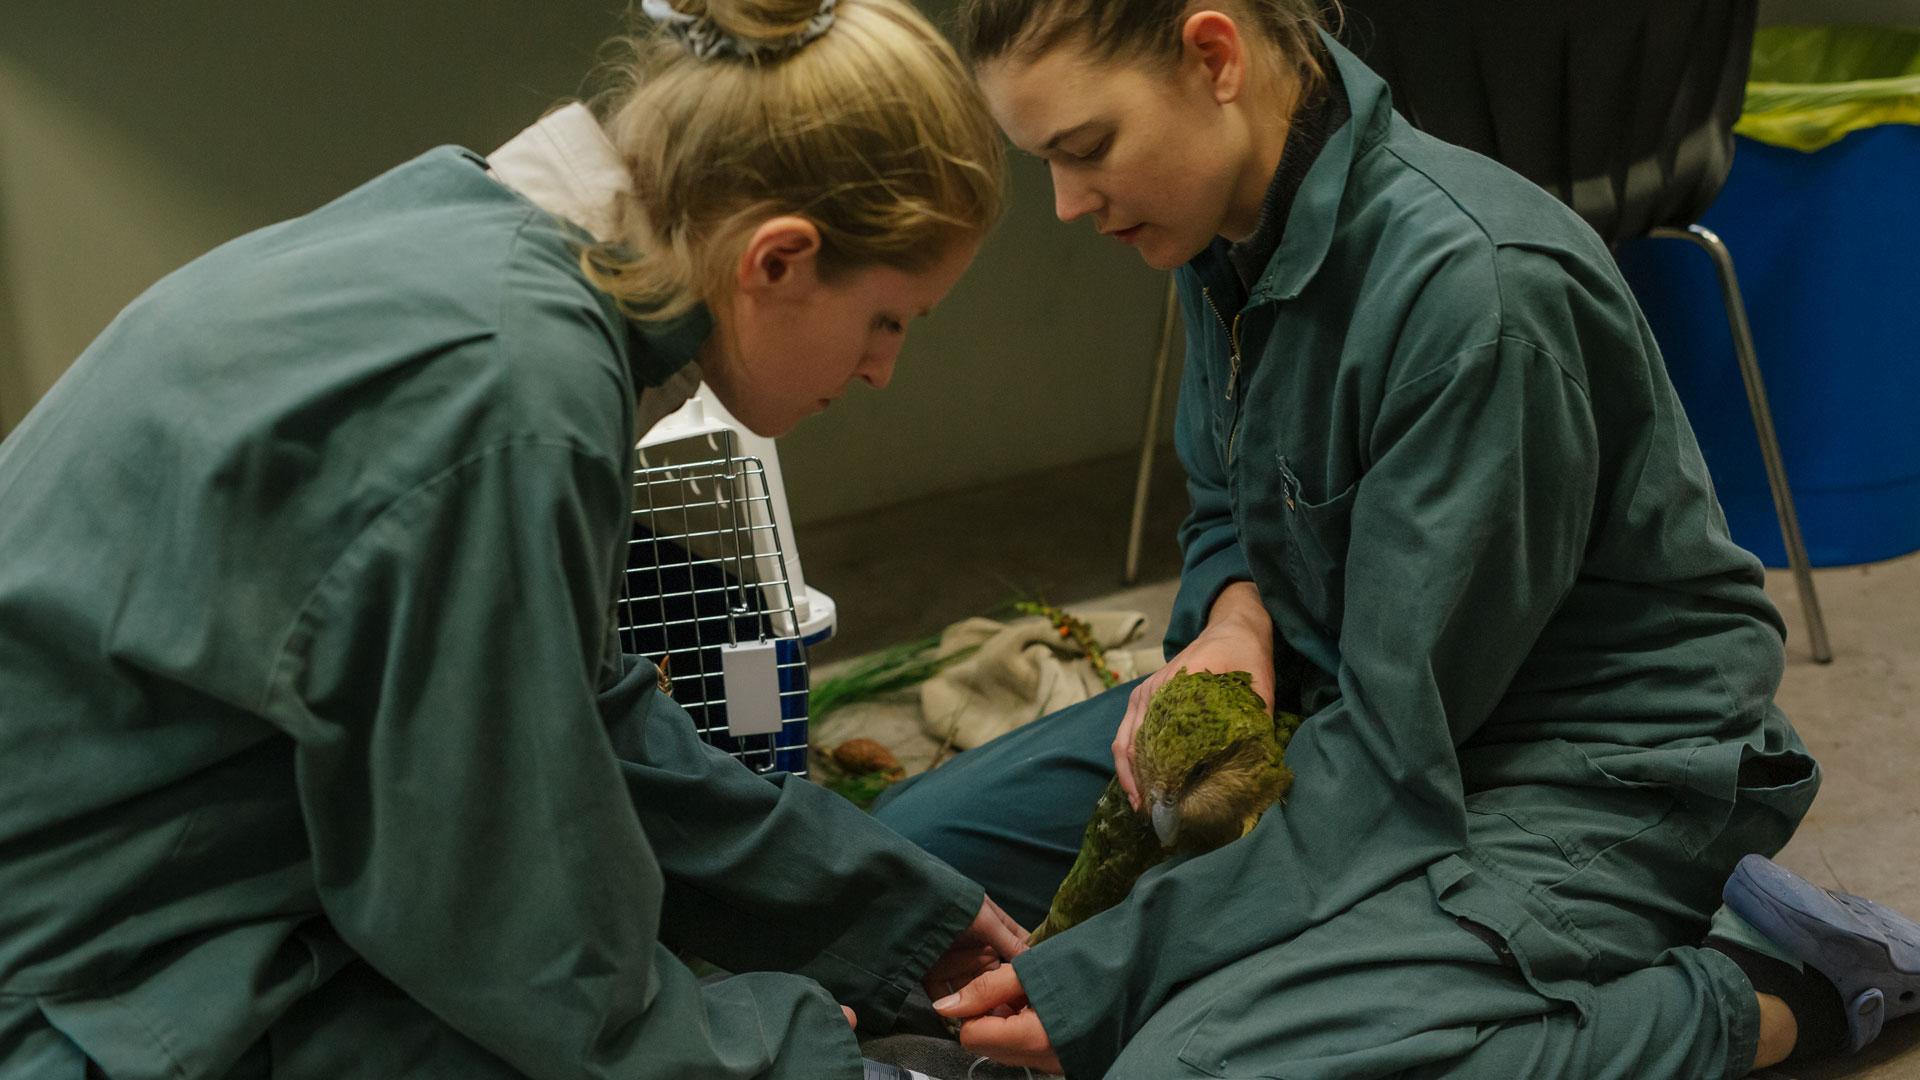 https://rfacdn.nz/zoo/assets/media/kakapo-vet-hospital-hinemoa-gallery-1.jpg